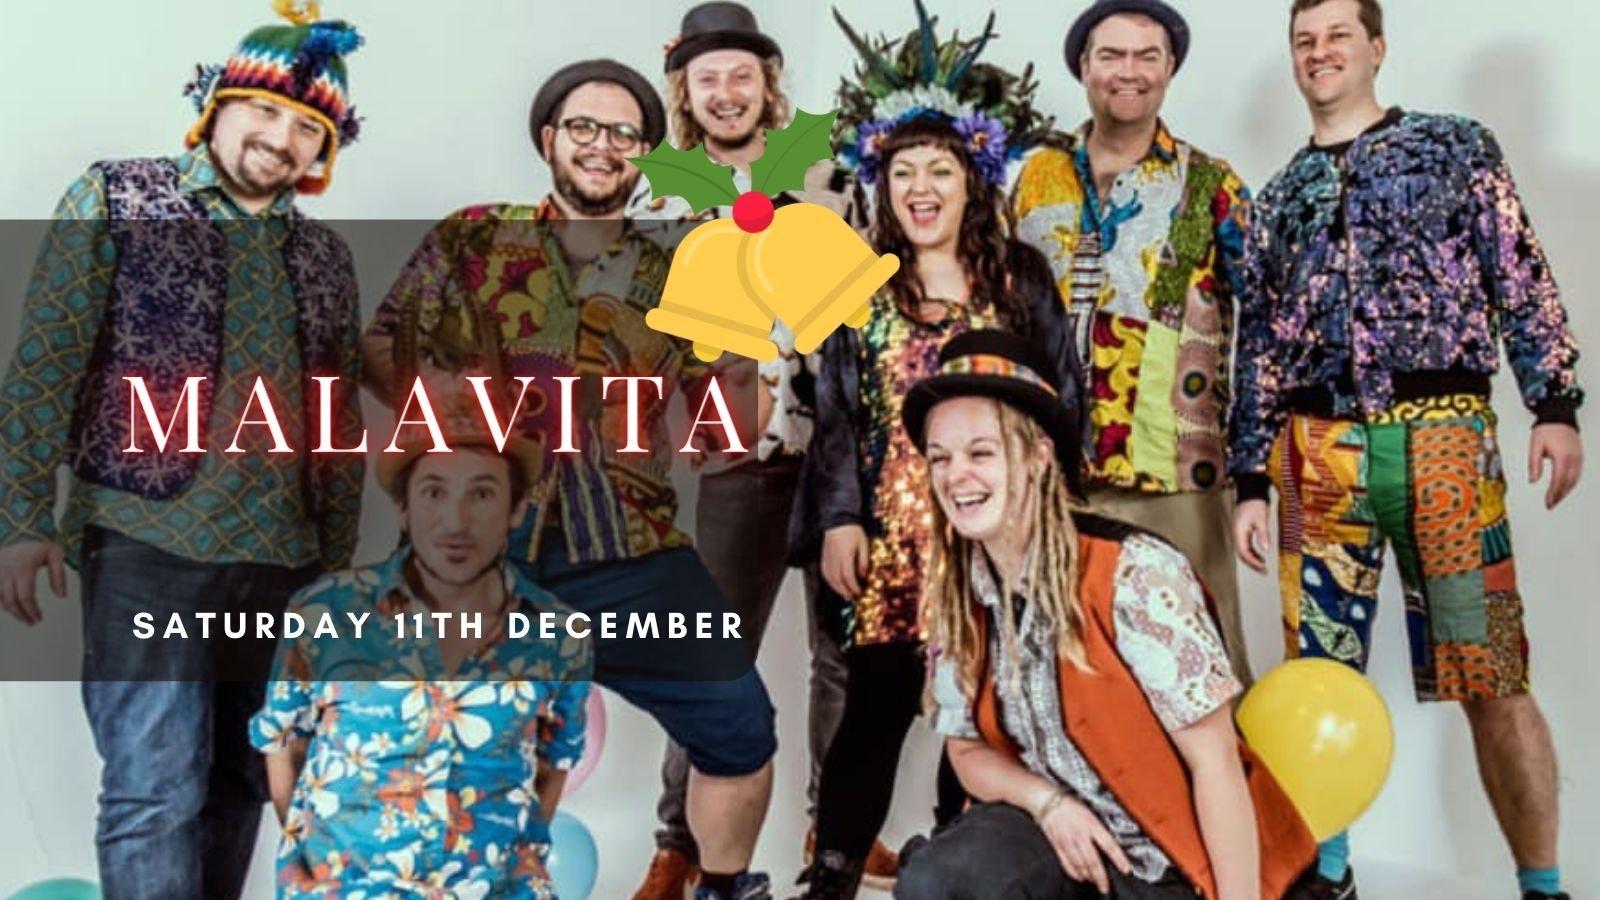 MALAVITA | Plymouth, Annabel's Cabaret & Discotheque